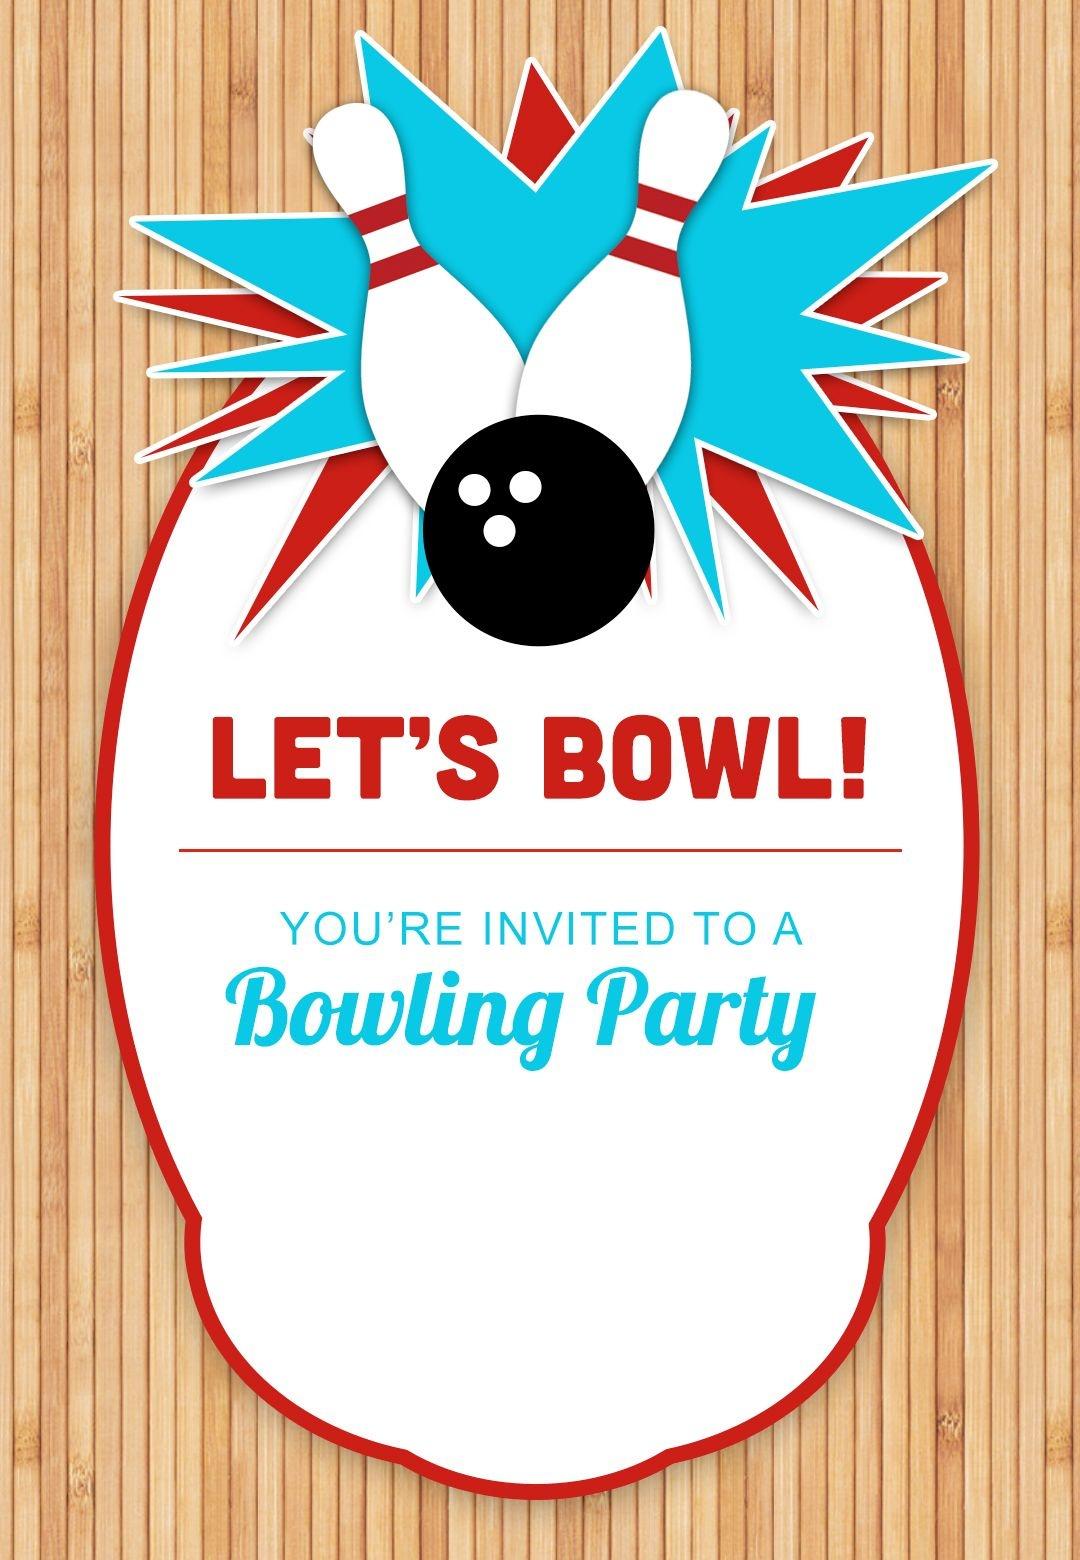 Bowling Party - Free Printable Birthday Invitation Template - Free Printable Bowling Invitation Templates